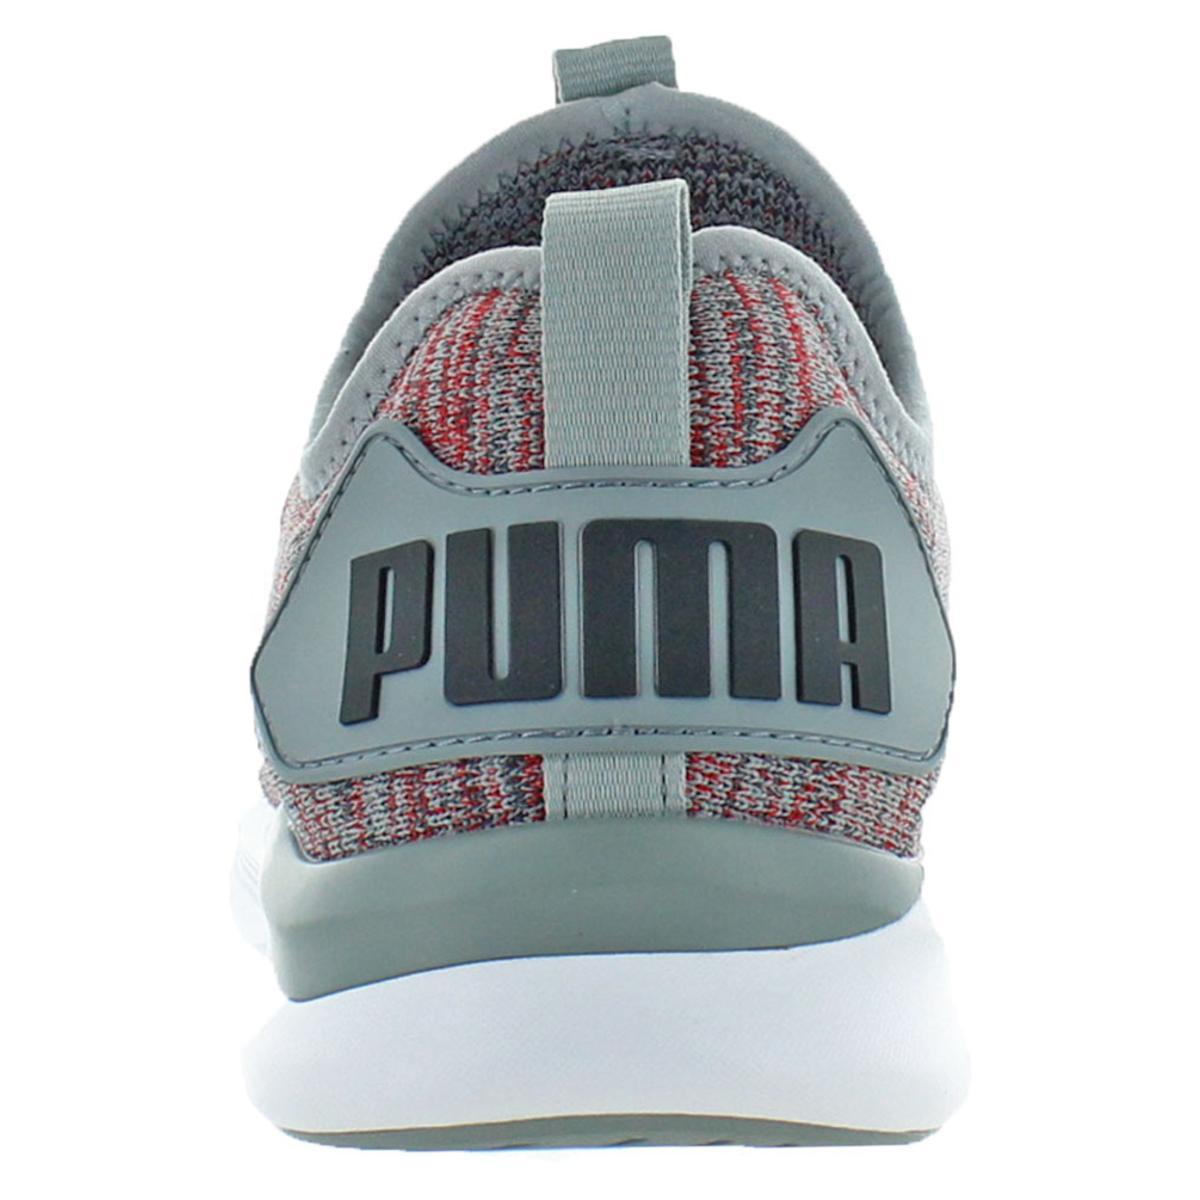 Puma-IGNITE-Flash-evoKNIT-Men-039-s-Knit-Mid-Top-Athleisure-Trainer-Sneaker-Shoes thumbnail 9